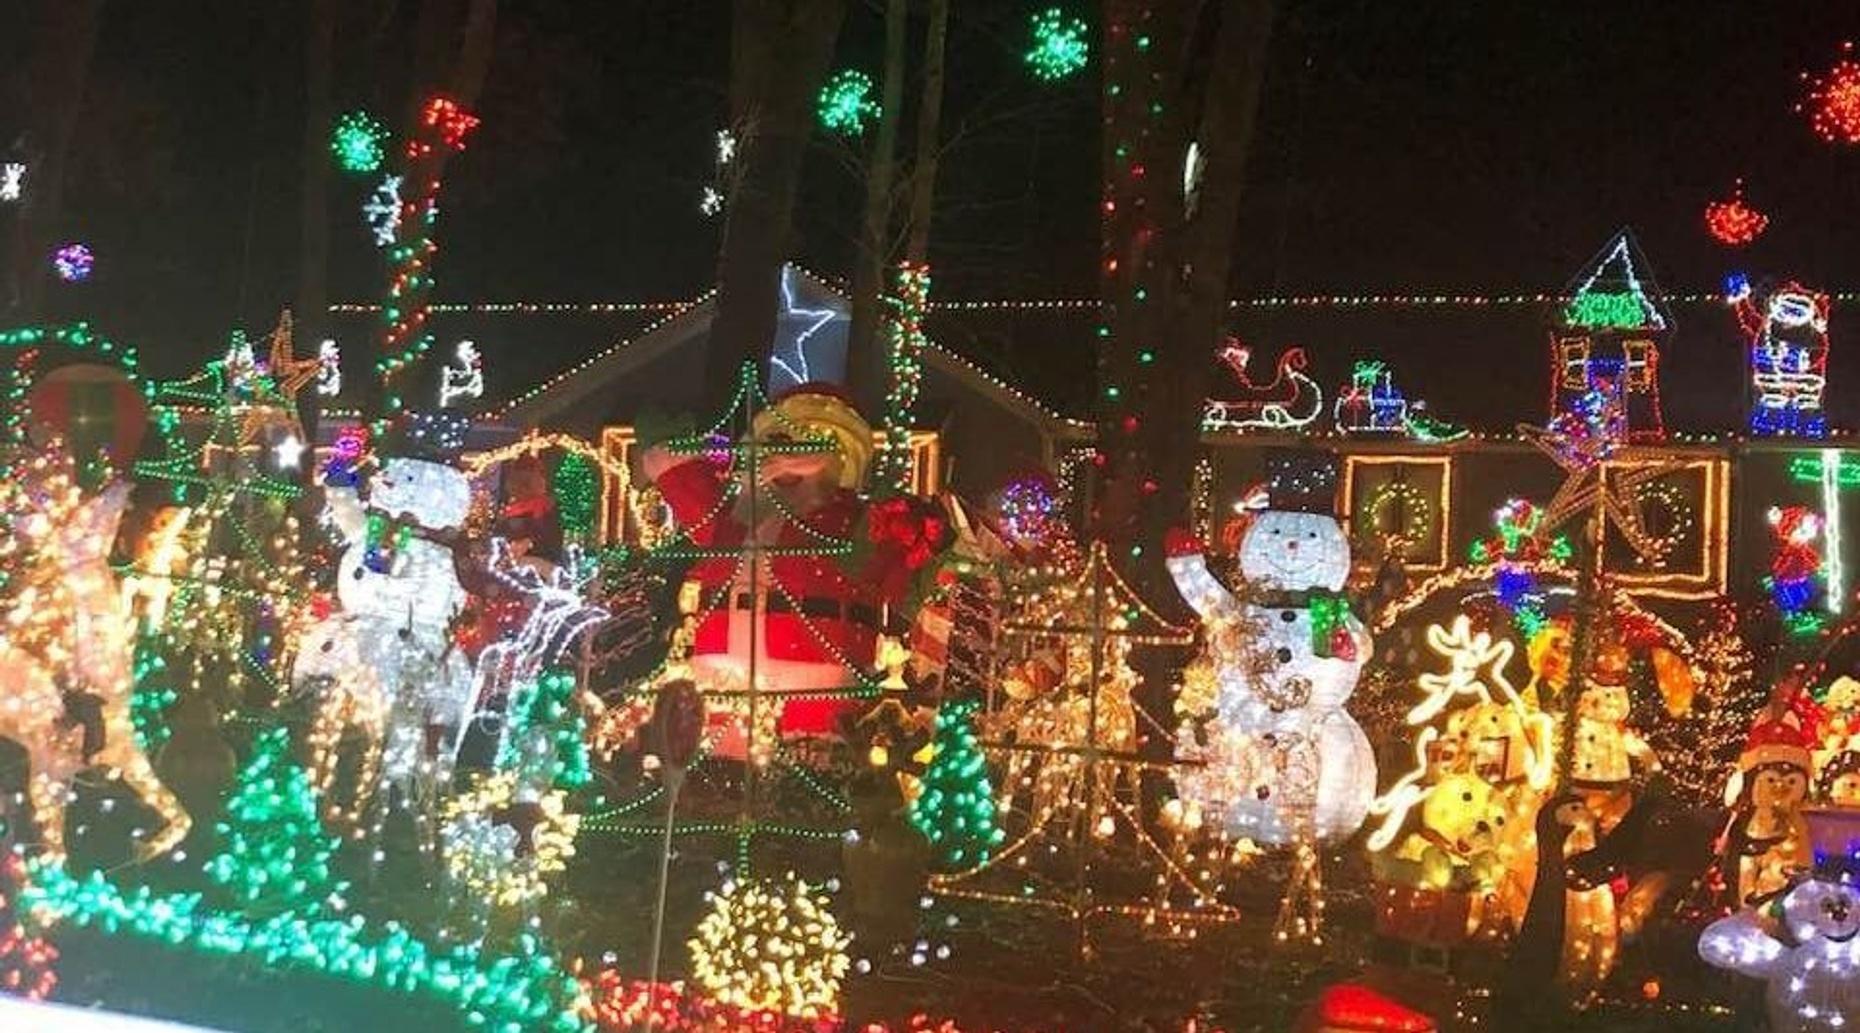 Oak City Holiday Sights & History